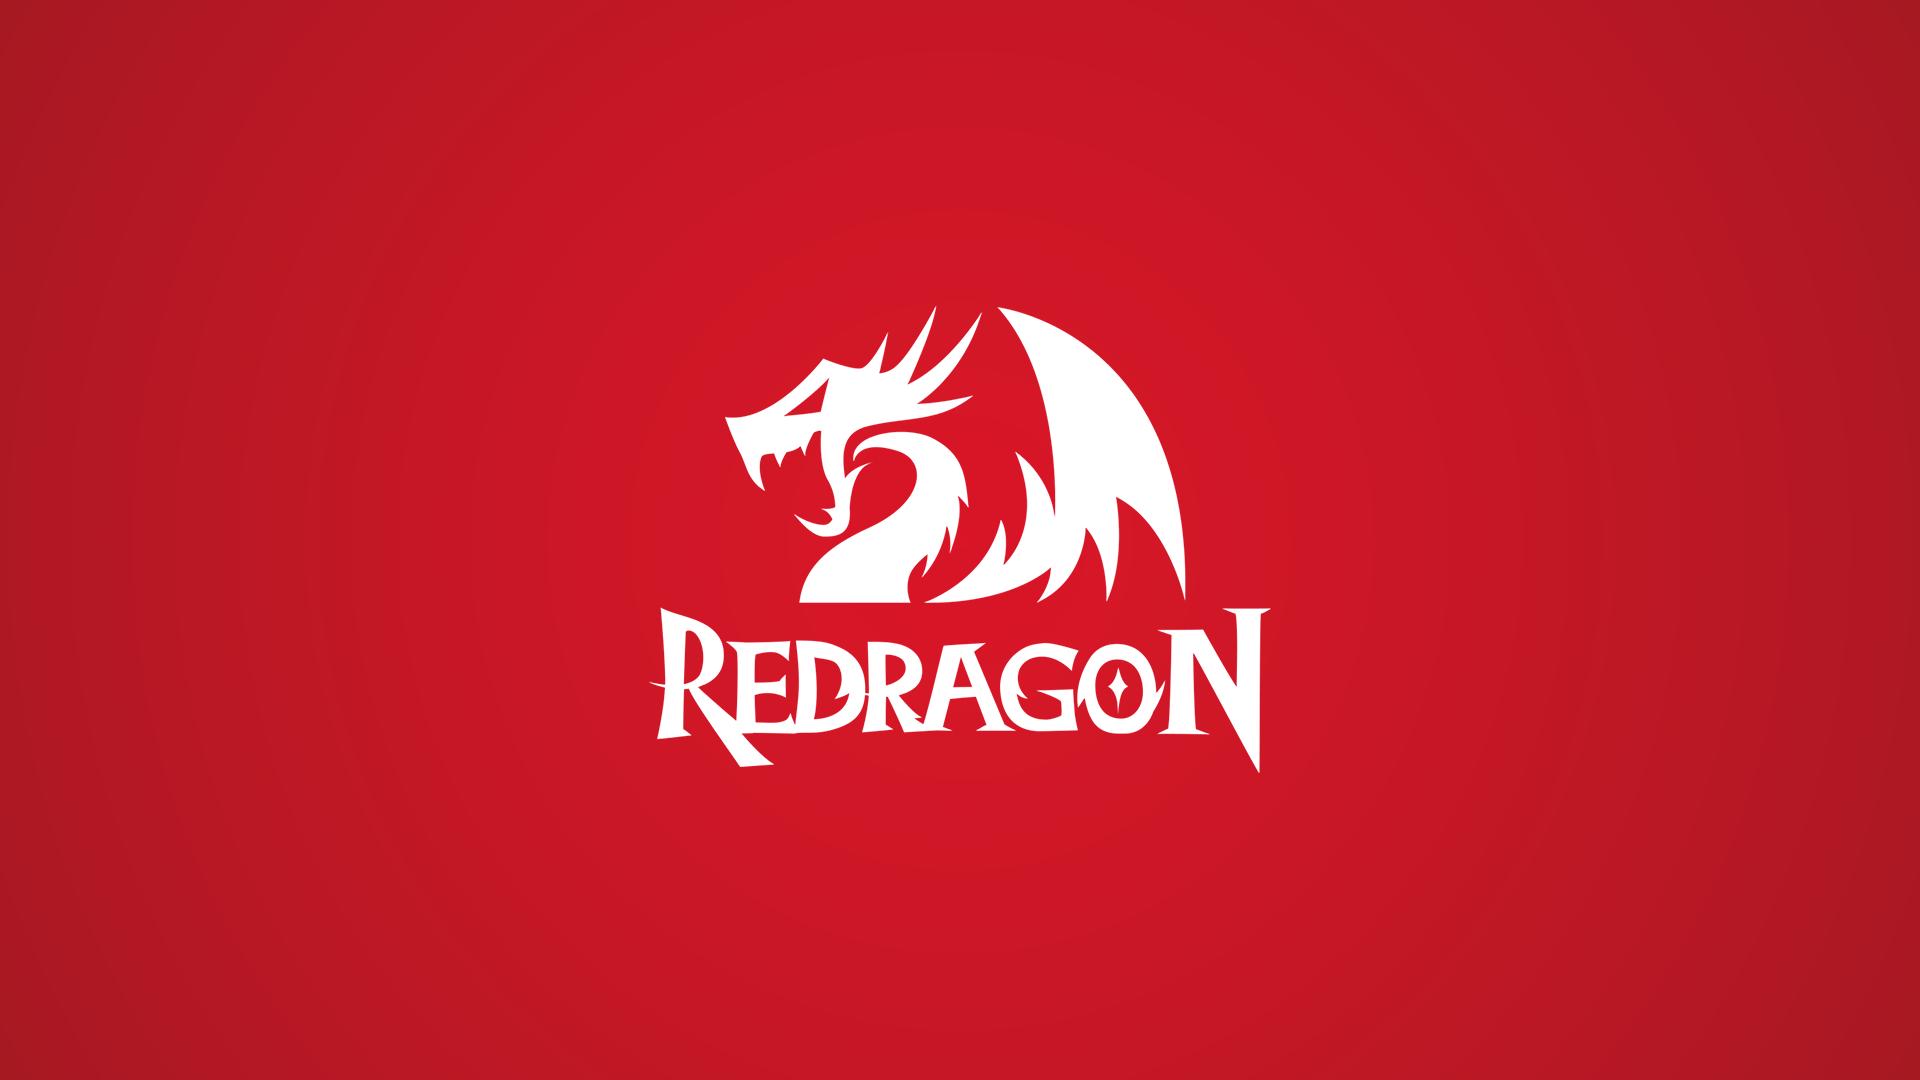 Wallpaper Redragon - Red